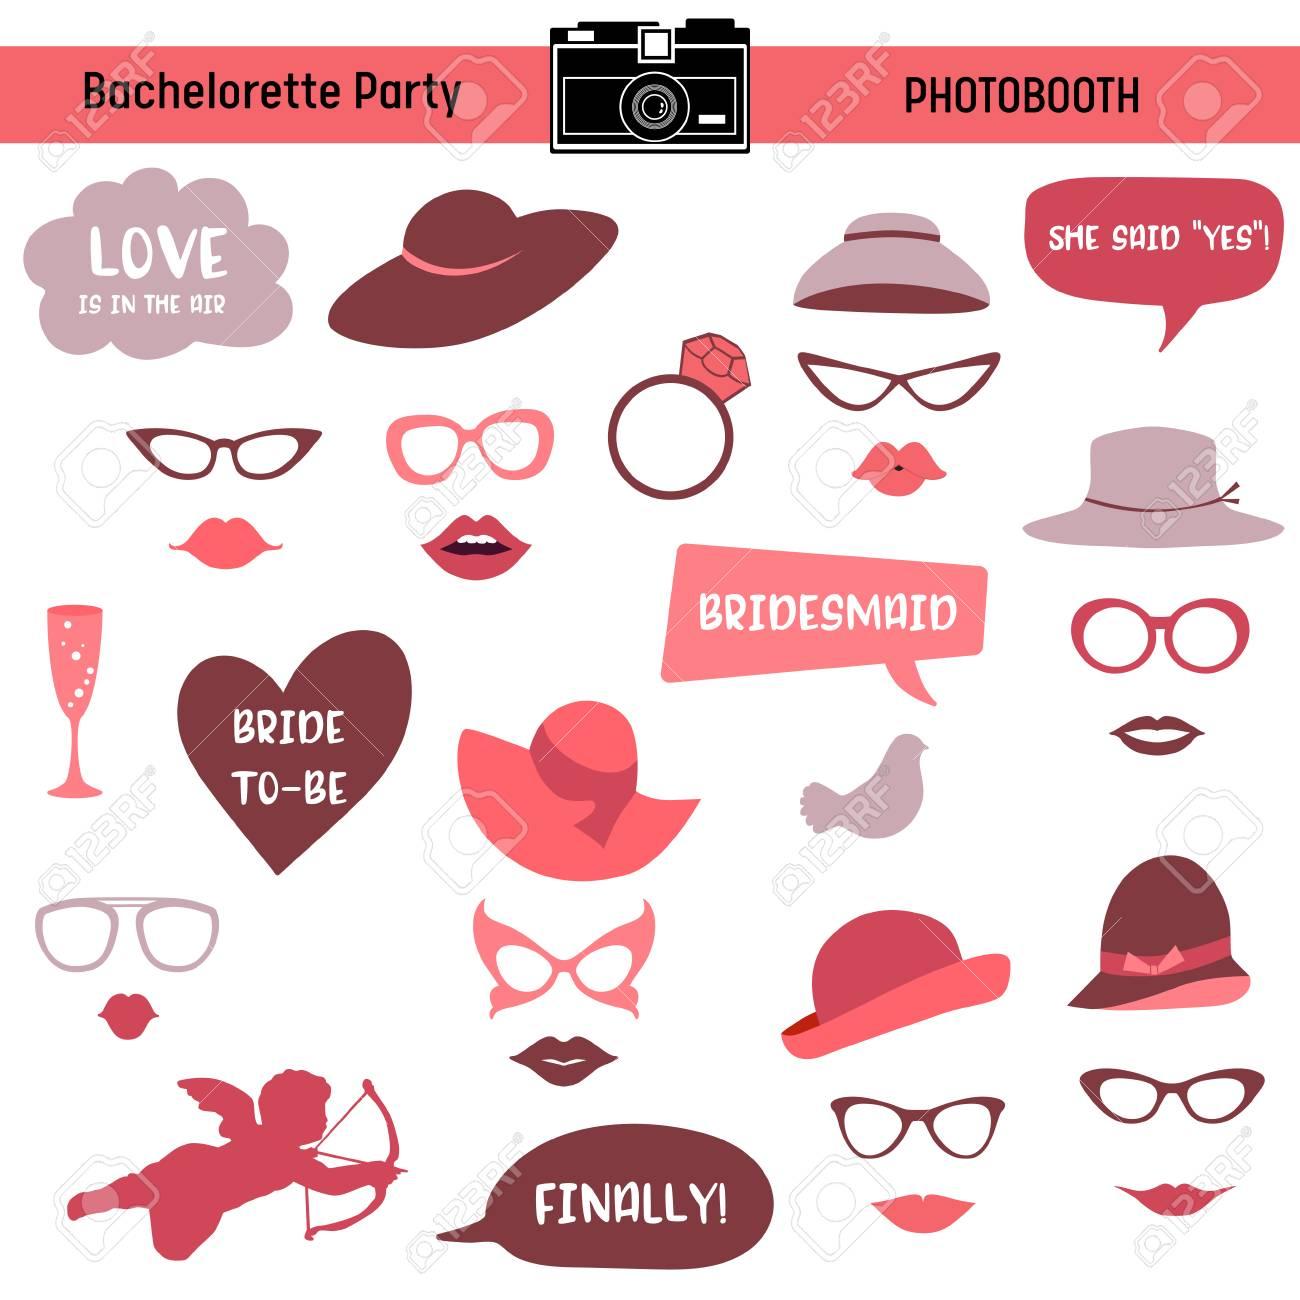 Bachelorette Event Hen Party Bridal Shower Printable Glasses